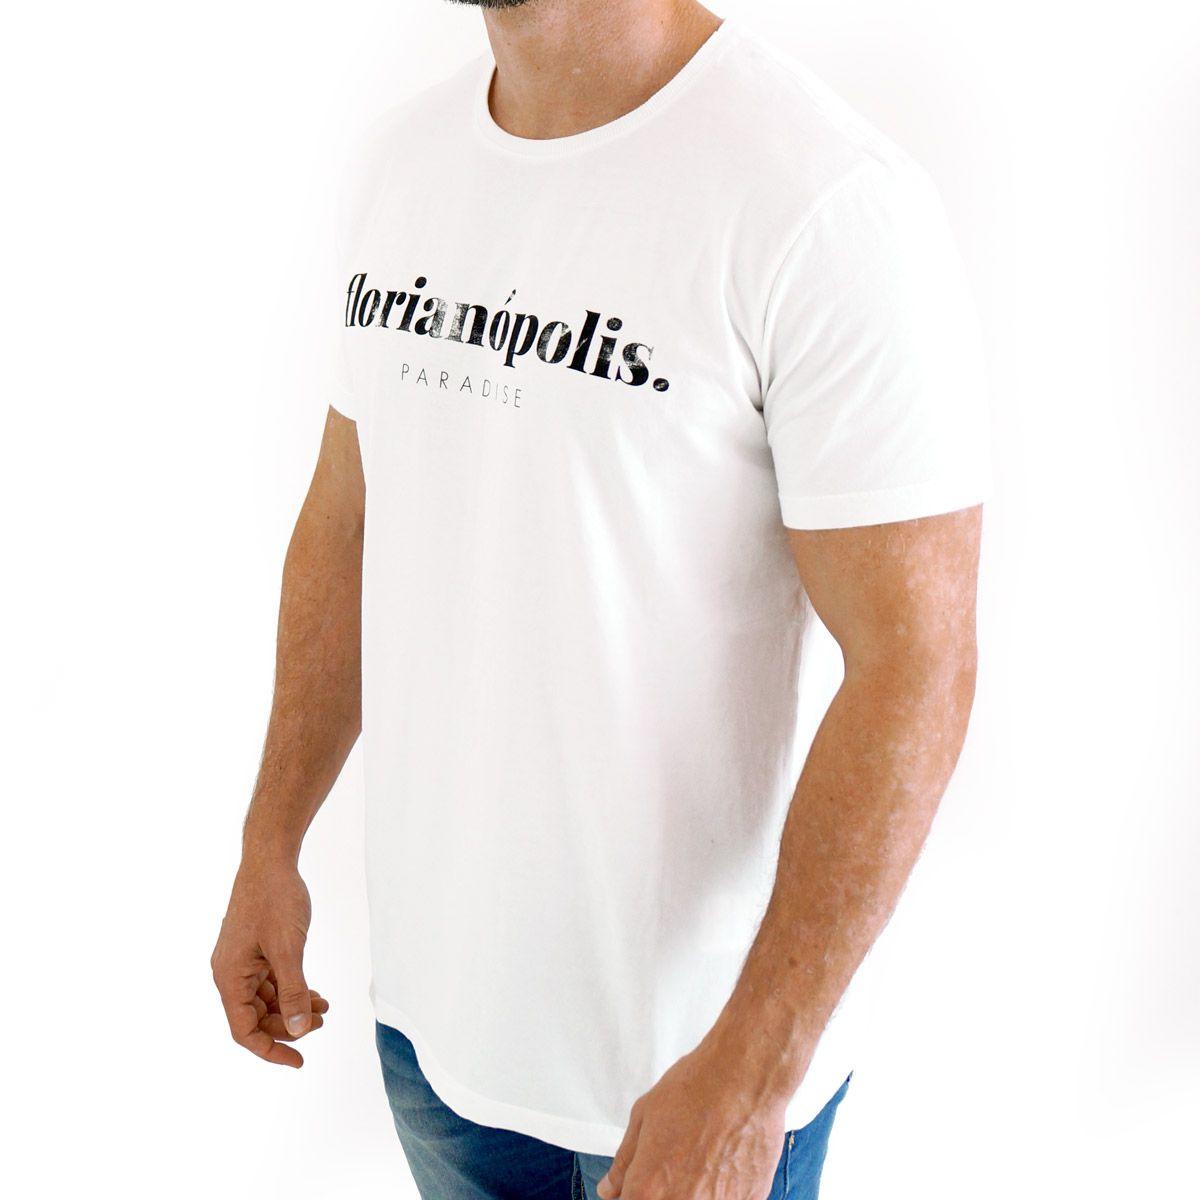 Camiseta Florianópolis Paradise